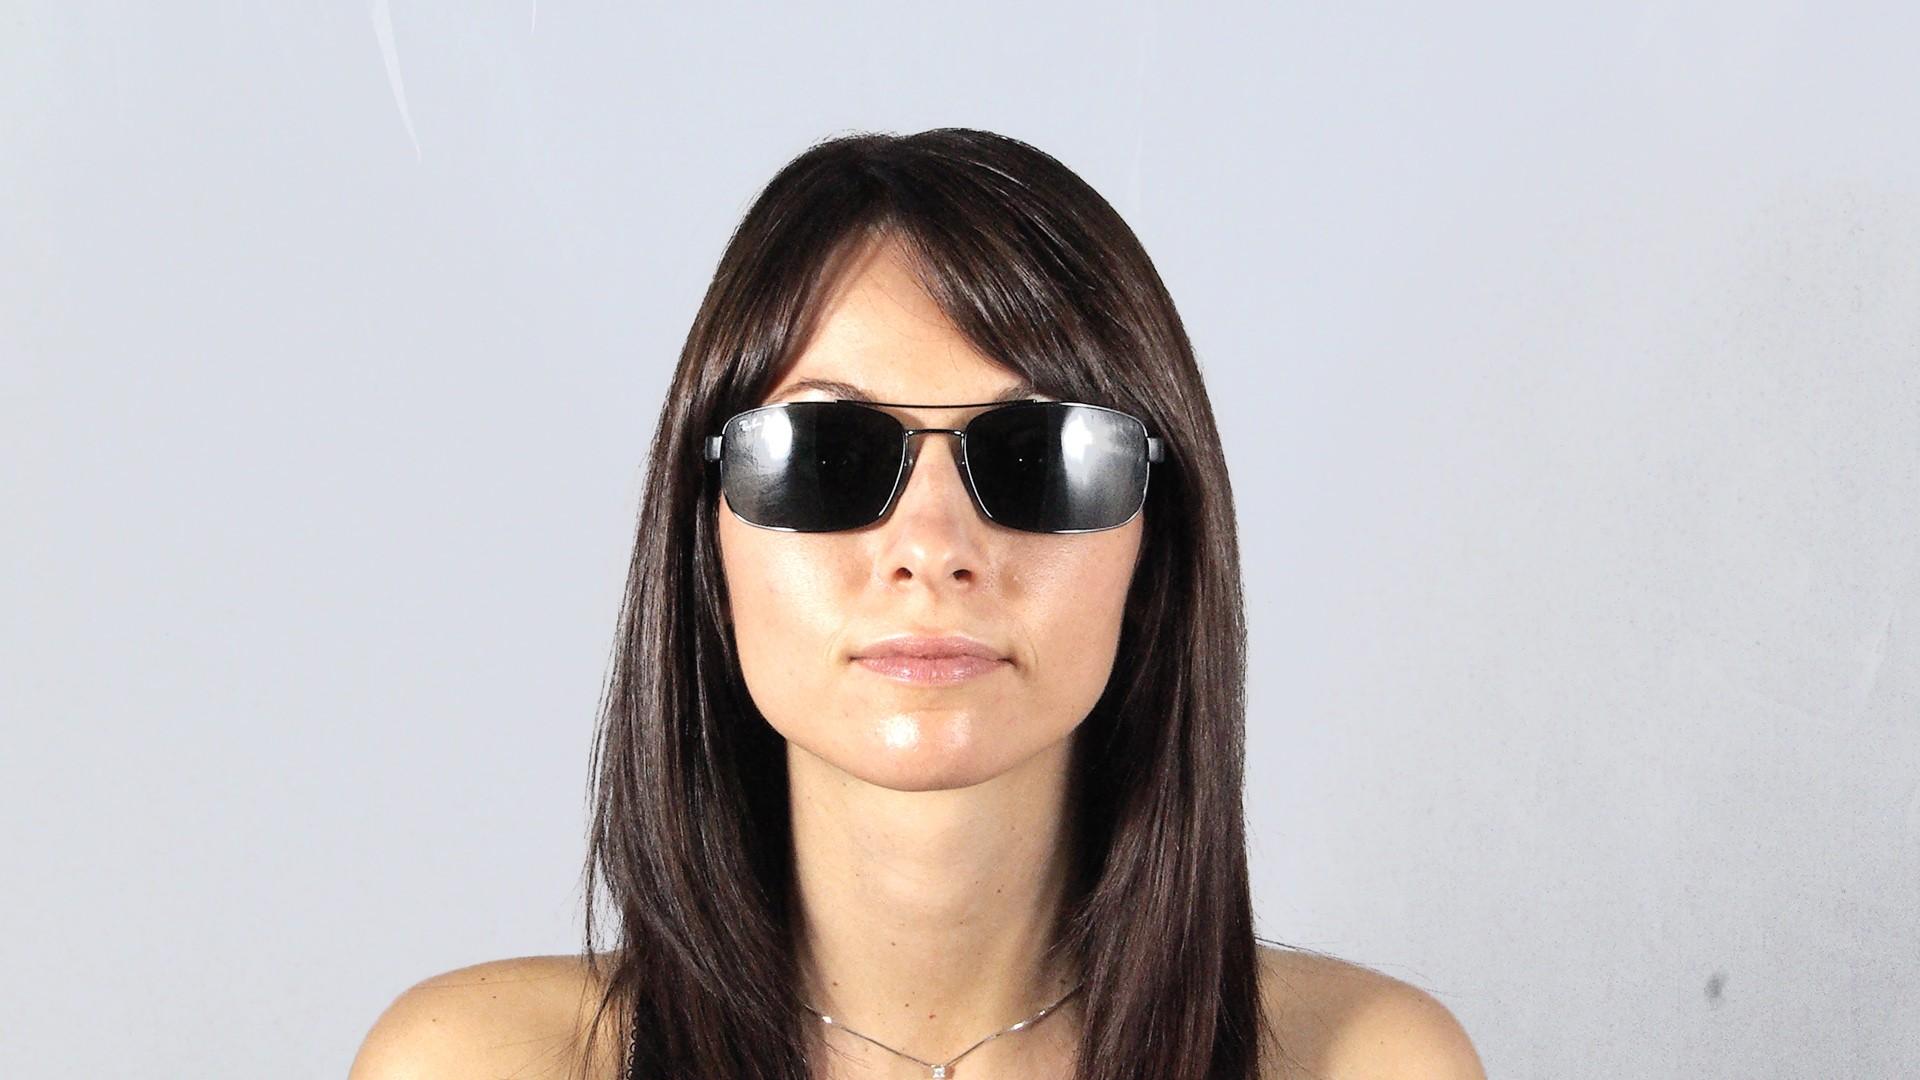 417de40fd94 Sunglasses Ray-Ban Fibre Carbon Black RB8316 002 N5 62-18 Large Polarized